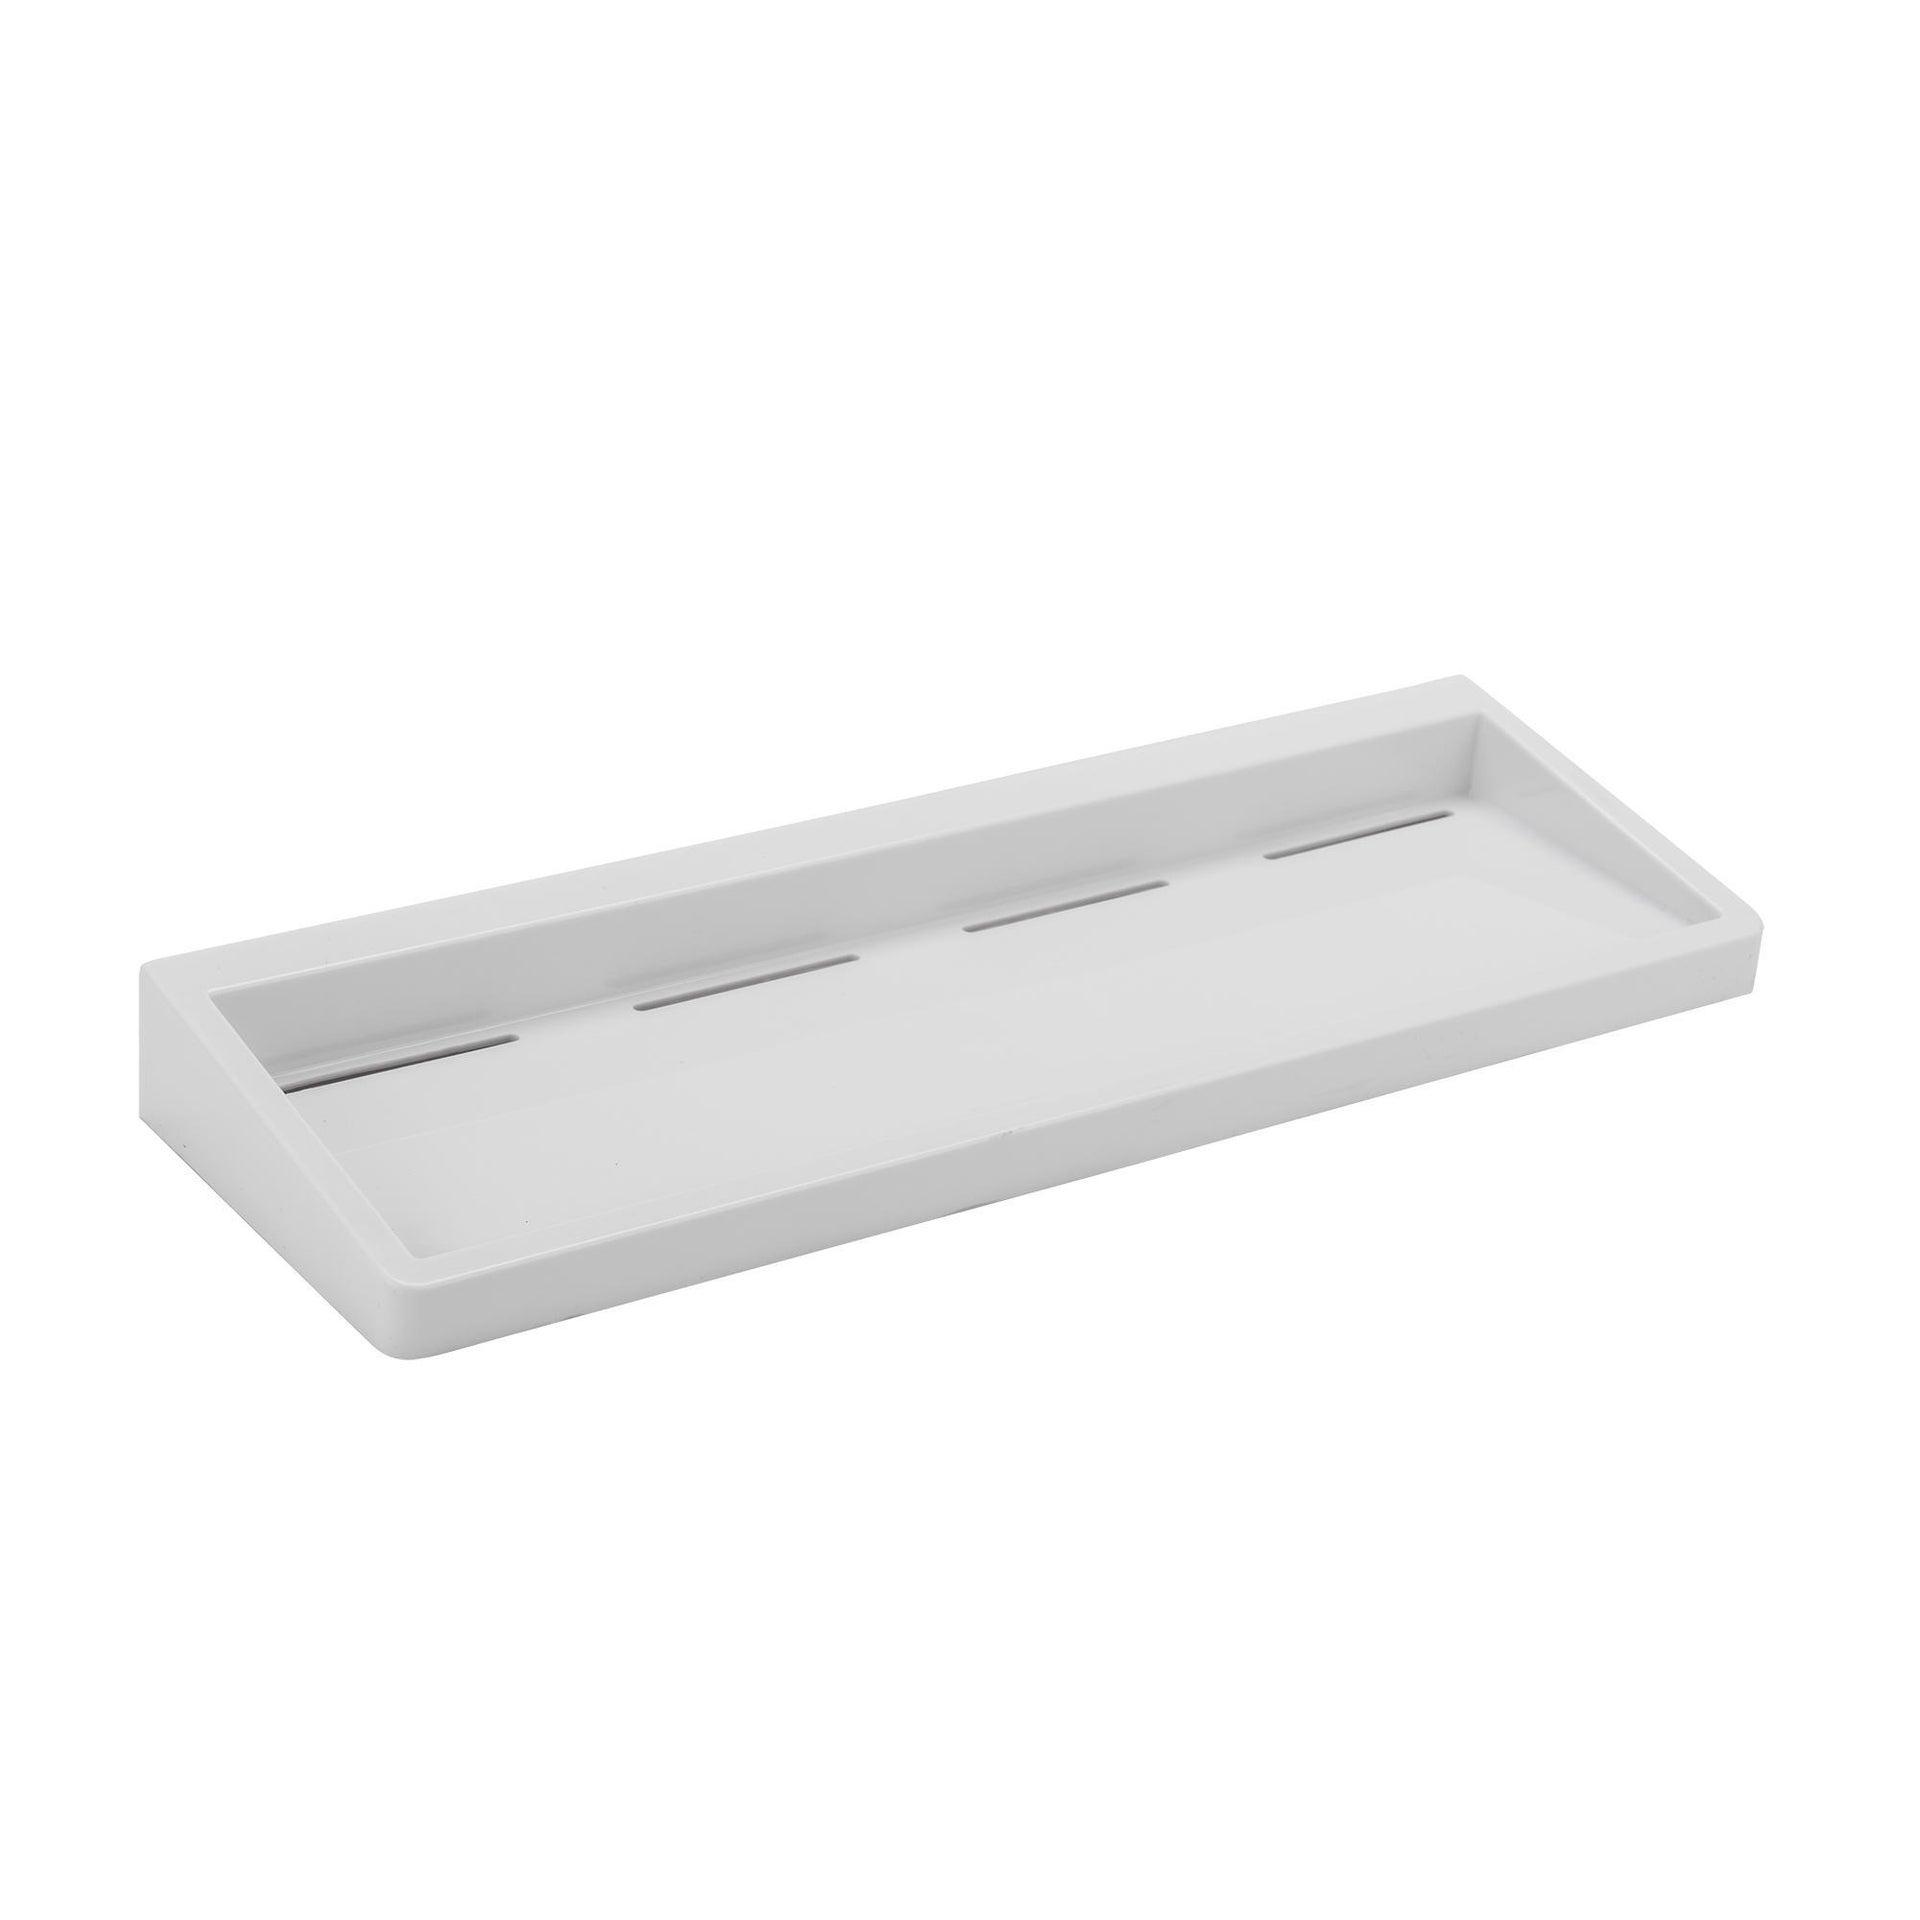 Mensola per bagno Funky L 40 cm bianco - 1